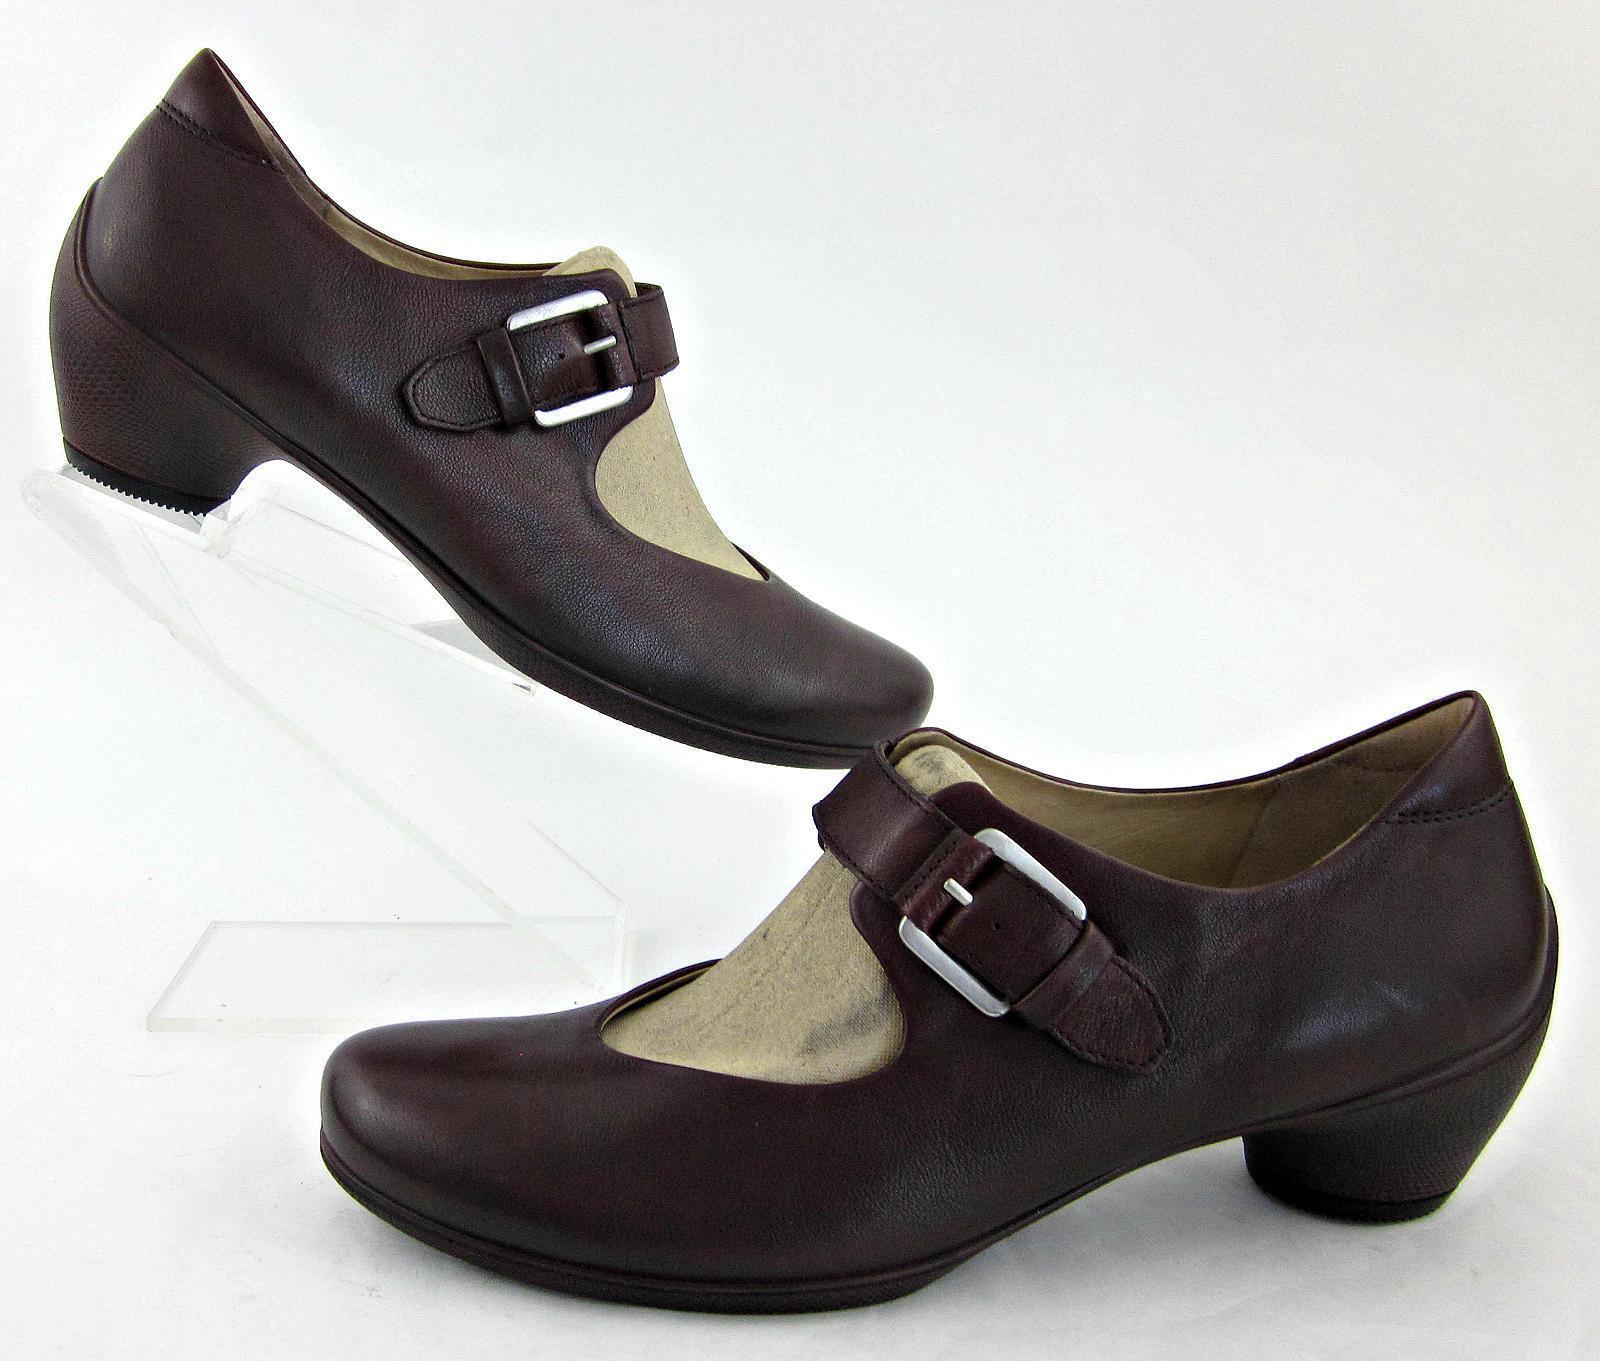 New! ECCO Mary Jane Low Heel Shoes Merlot Leather EU 42 / US 11-11.5